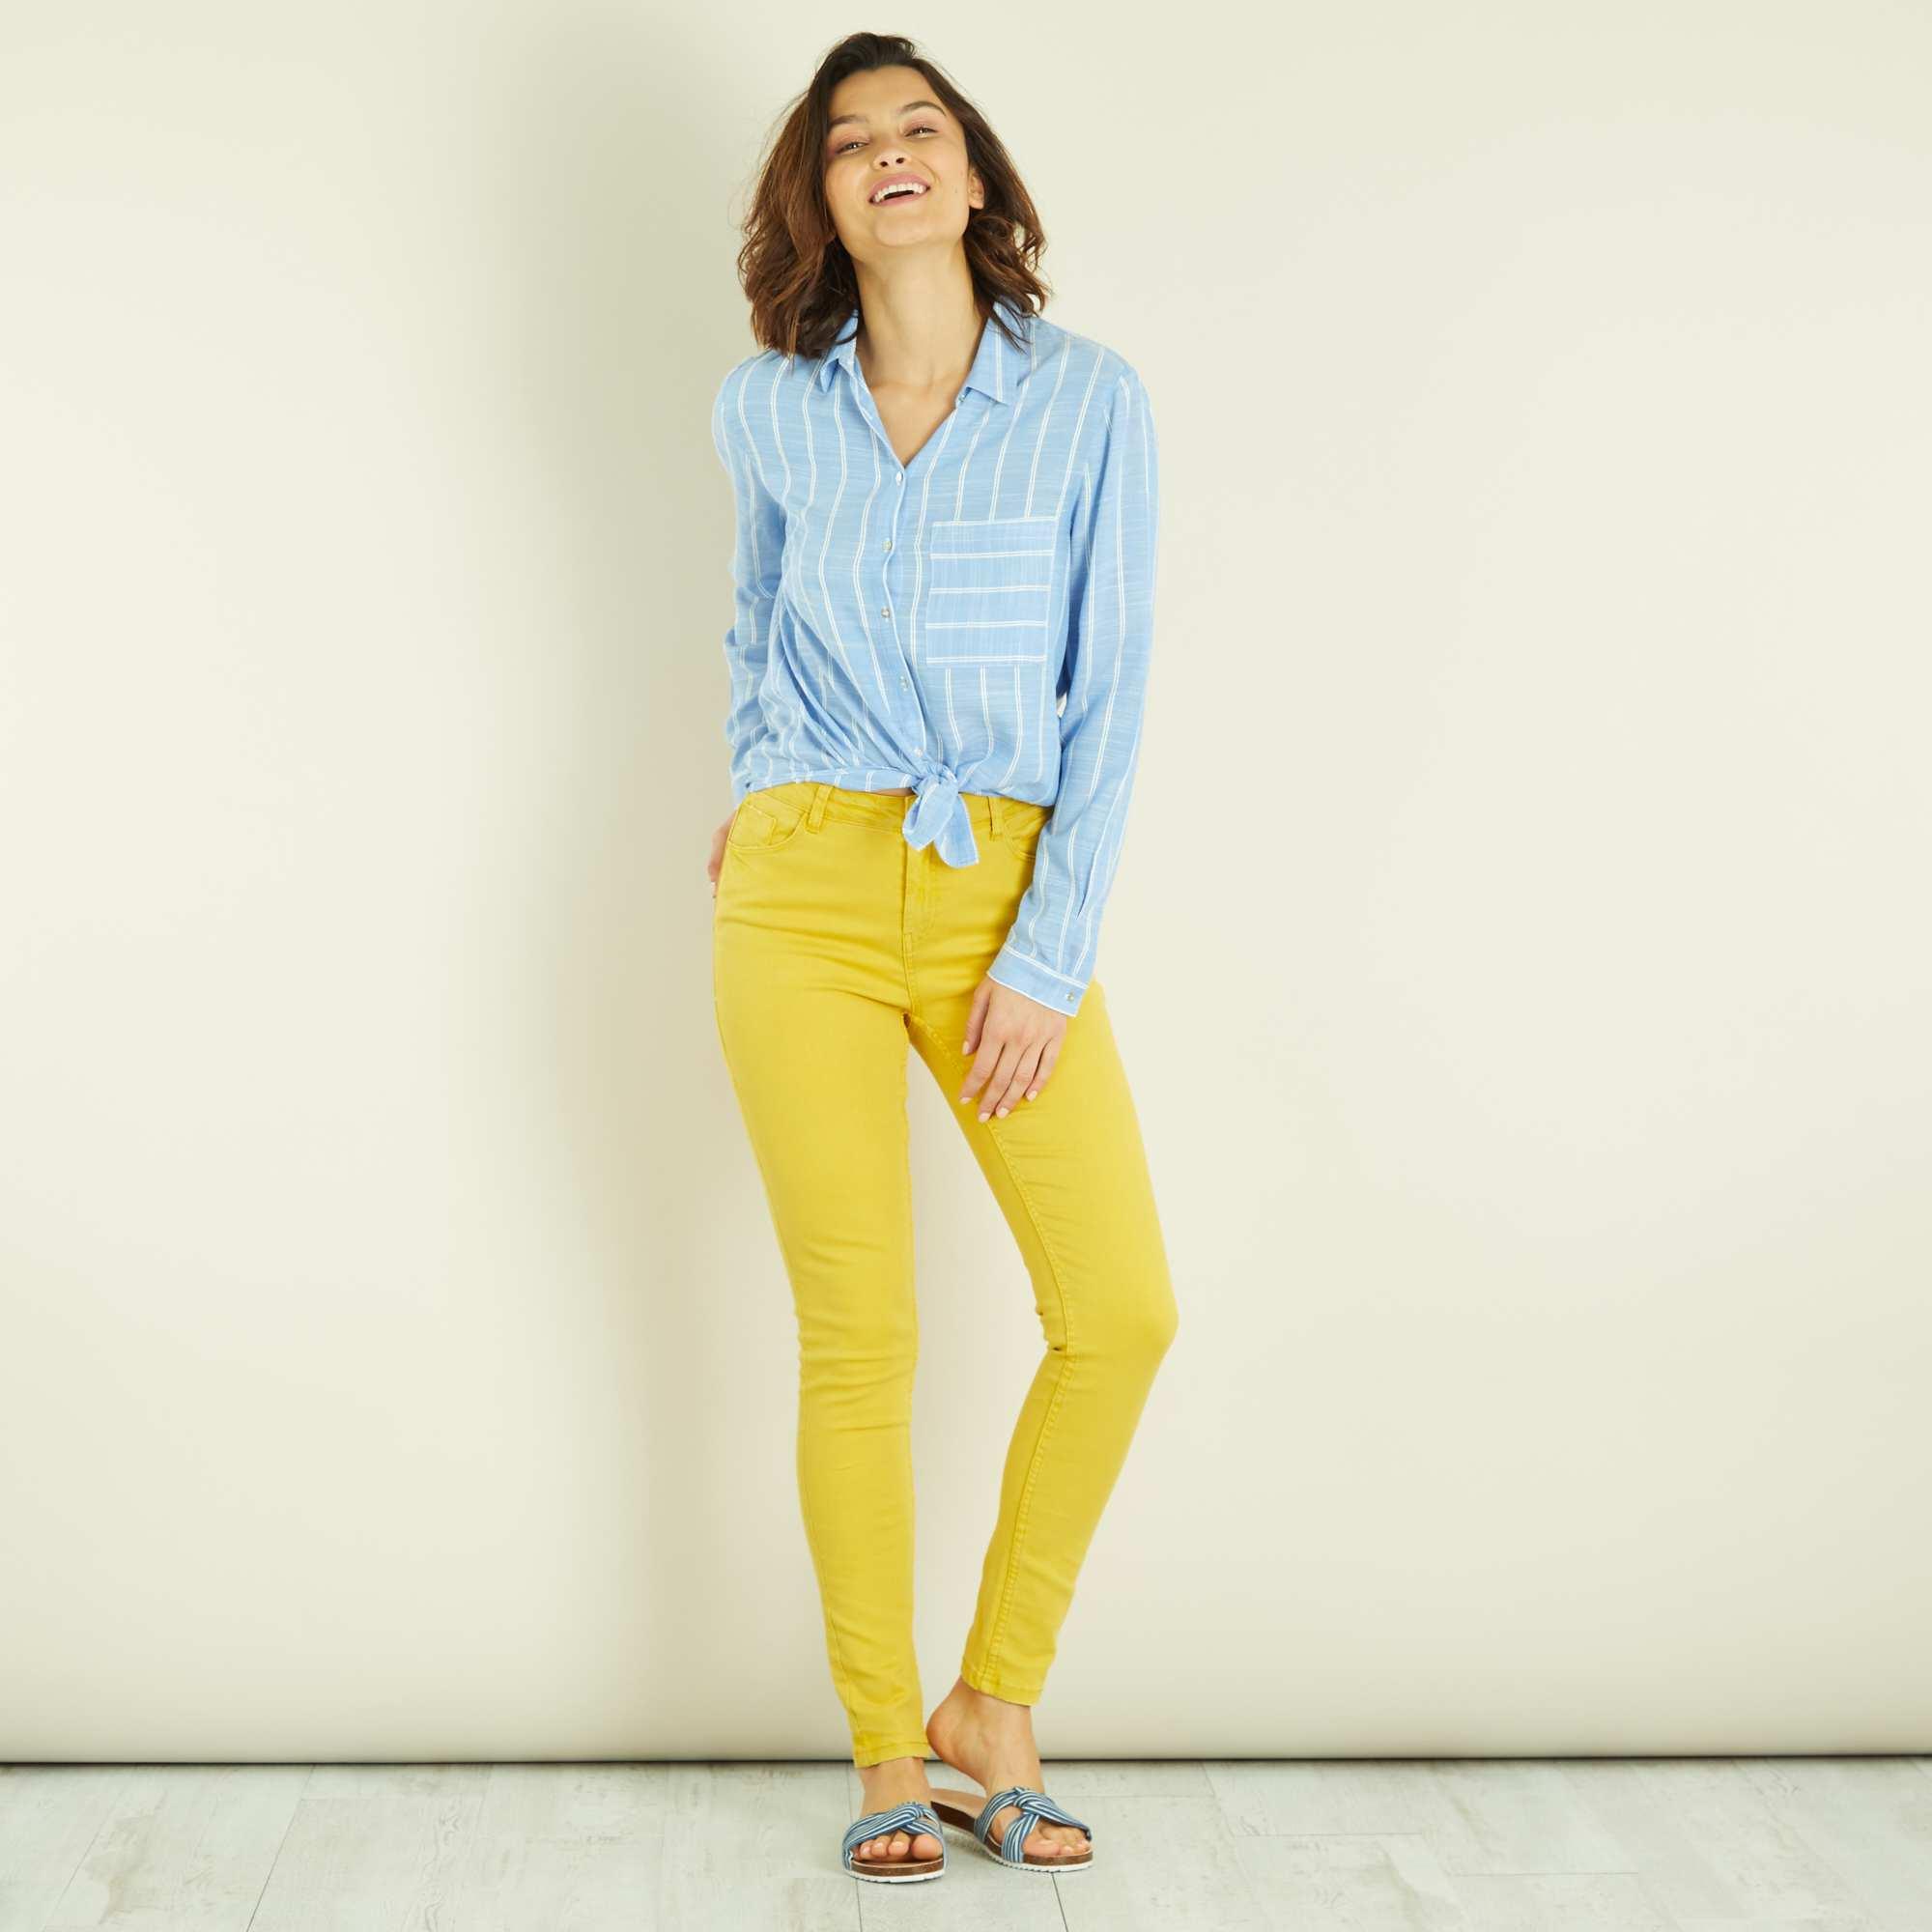 pantalon skinny 7 8e et taille haute femme jaune kiabi 14 40. Black Bedroom Furniture Sets. Home Design Ideas